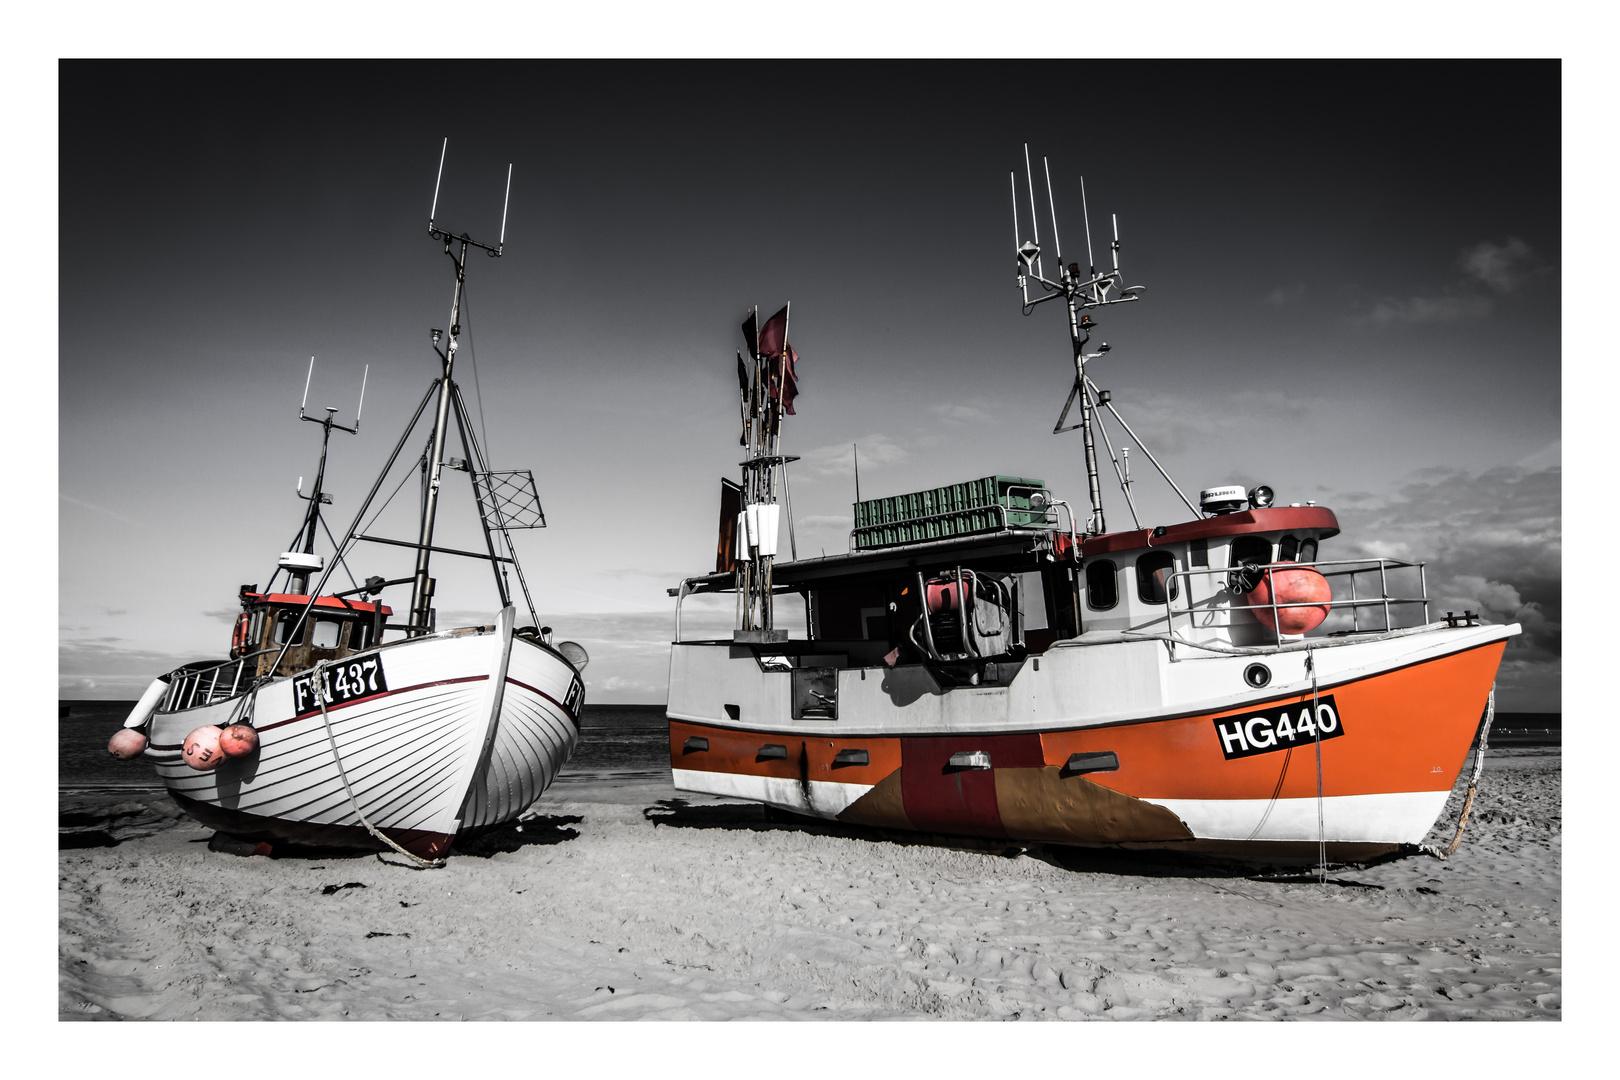 Fischerei in Dänemark